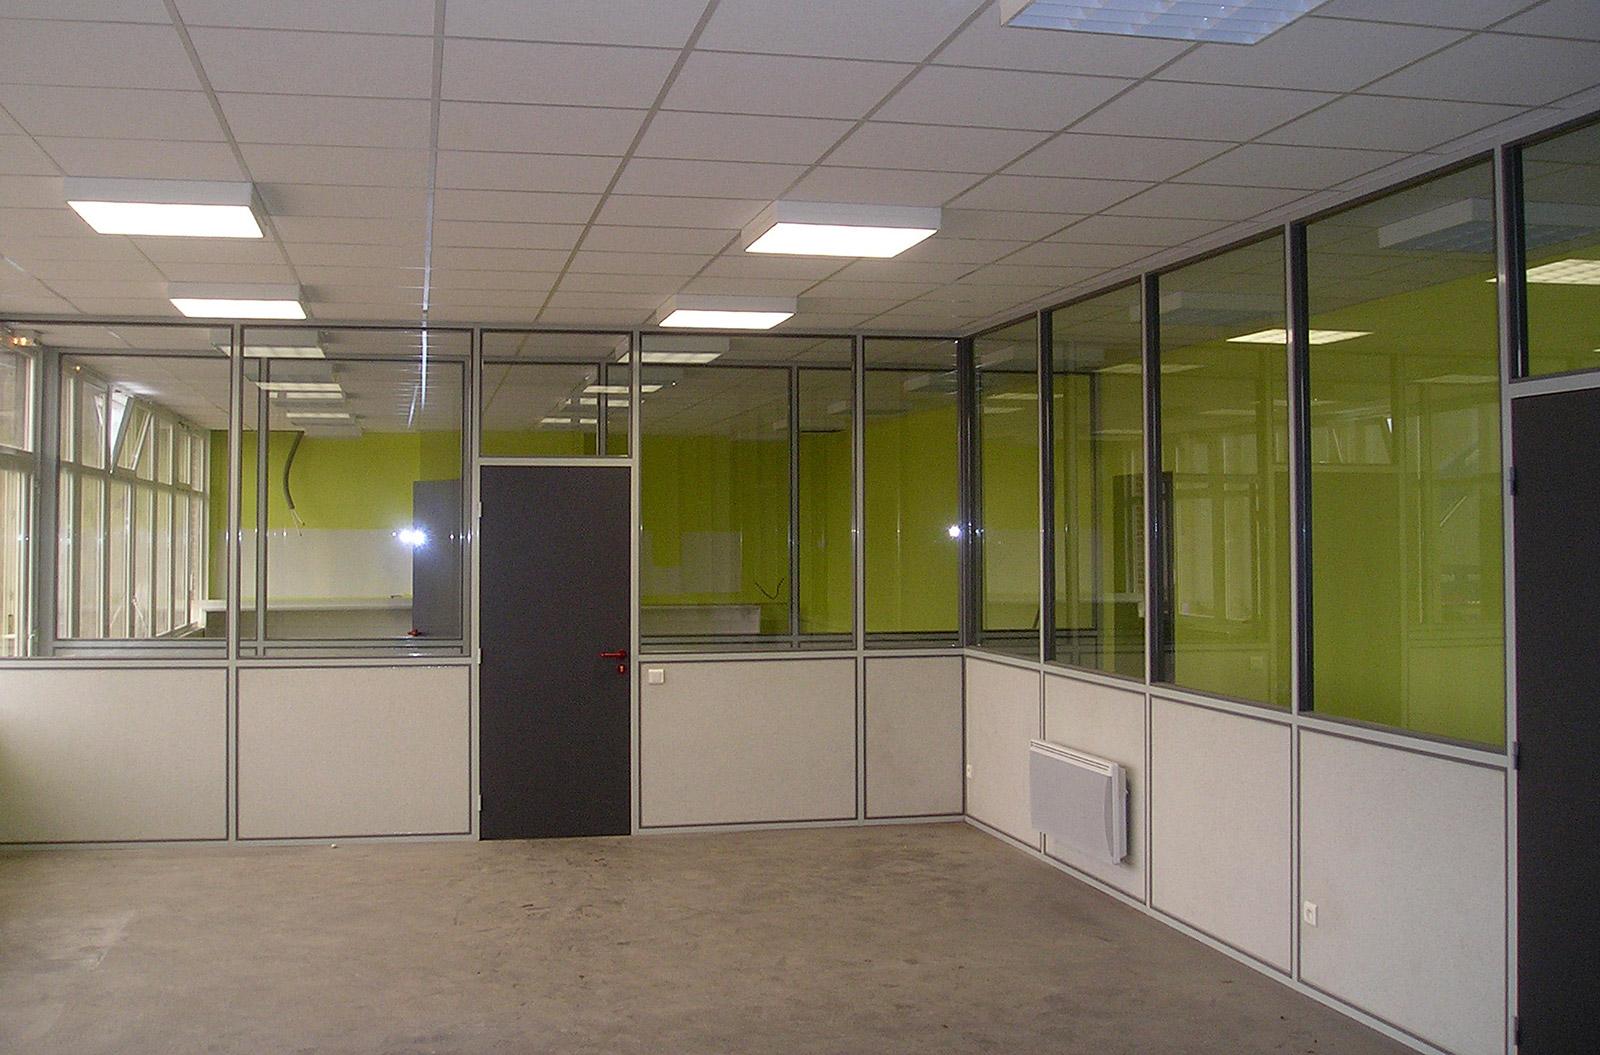 Nasal rayonnage galerie cloisons profil aluminium - Cloison aluminium bureau ...